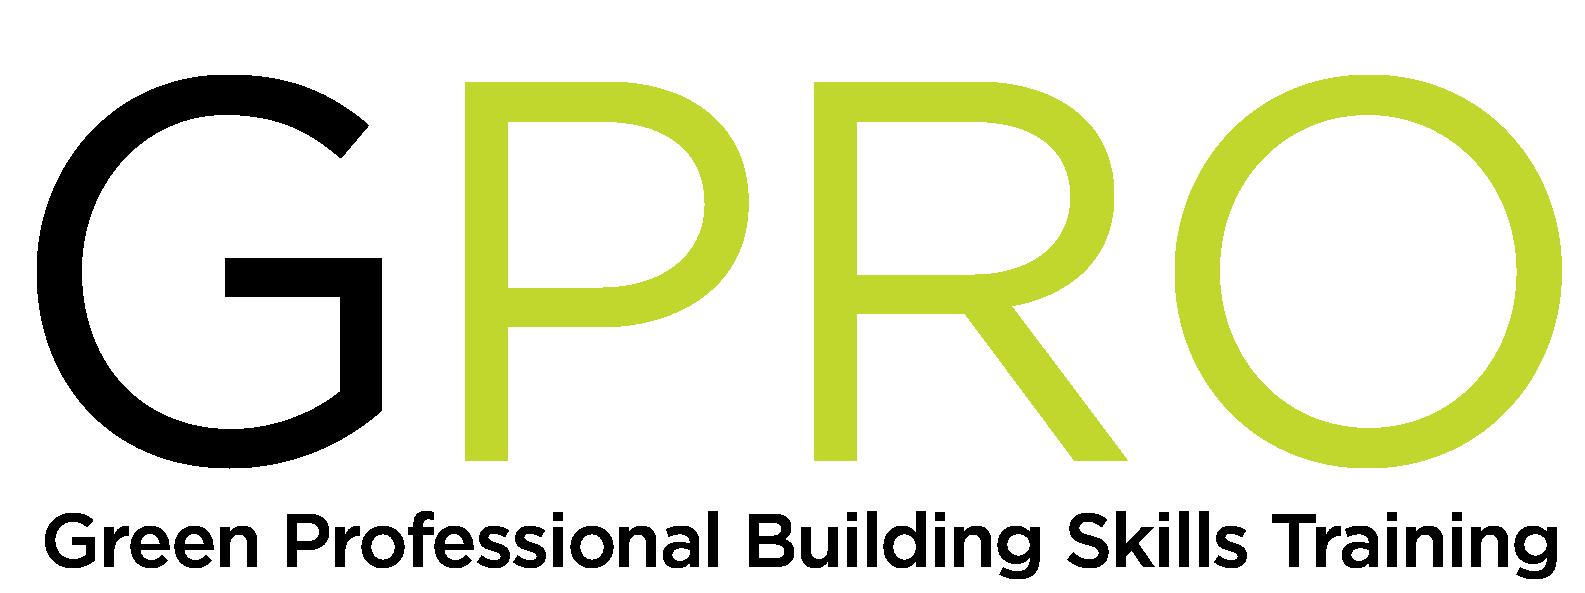 GPRO FUND tagline.png